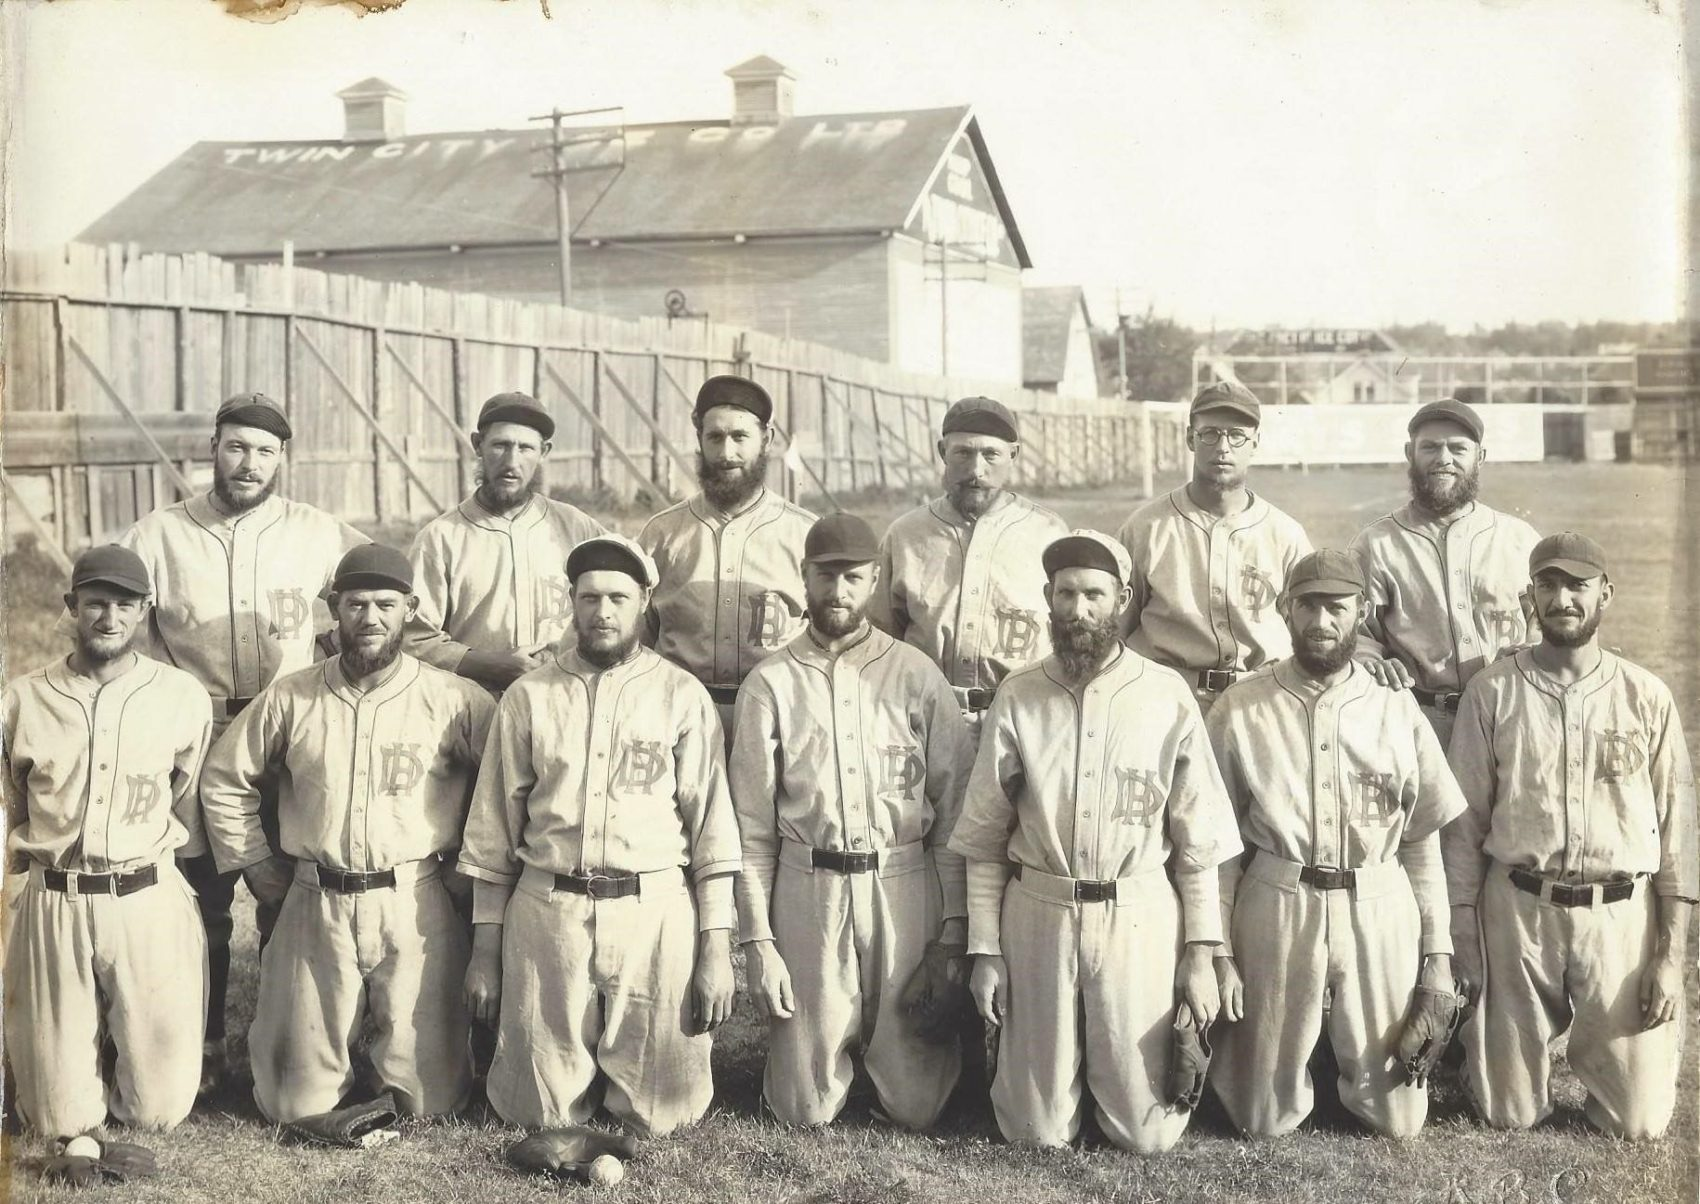 (Courtesy House of David Baseball Museum)